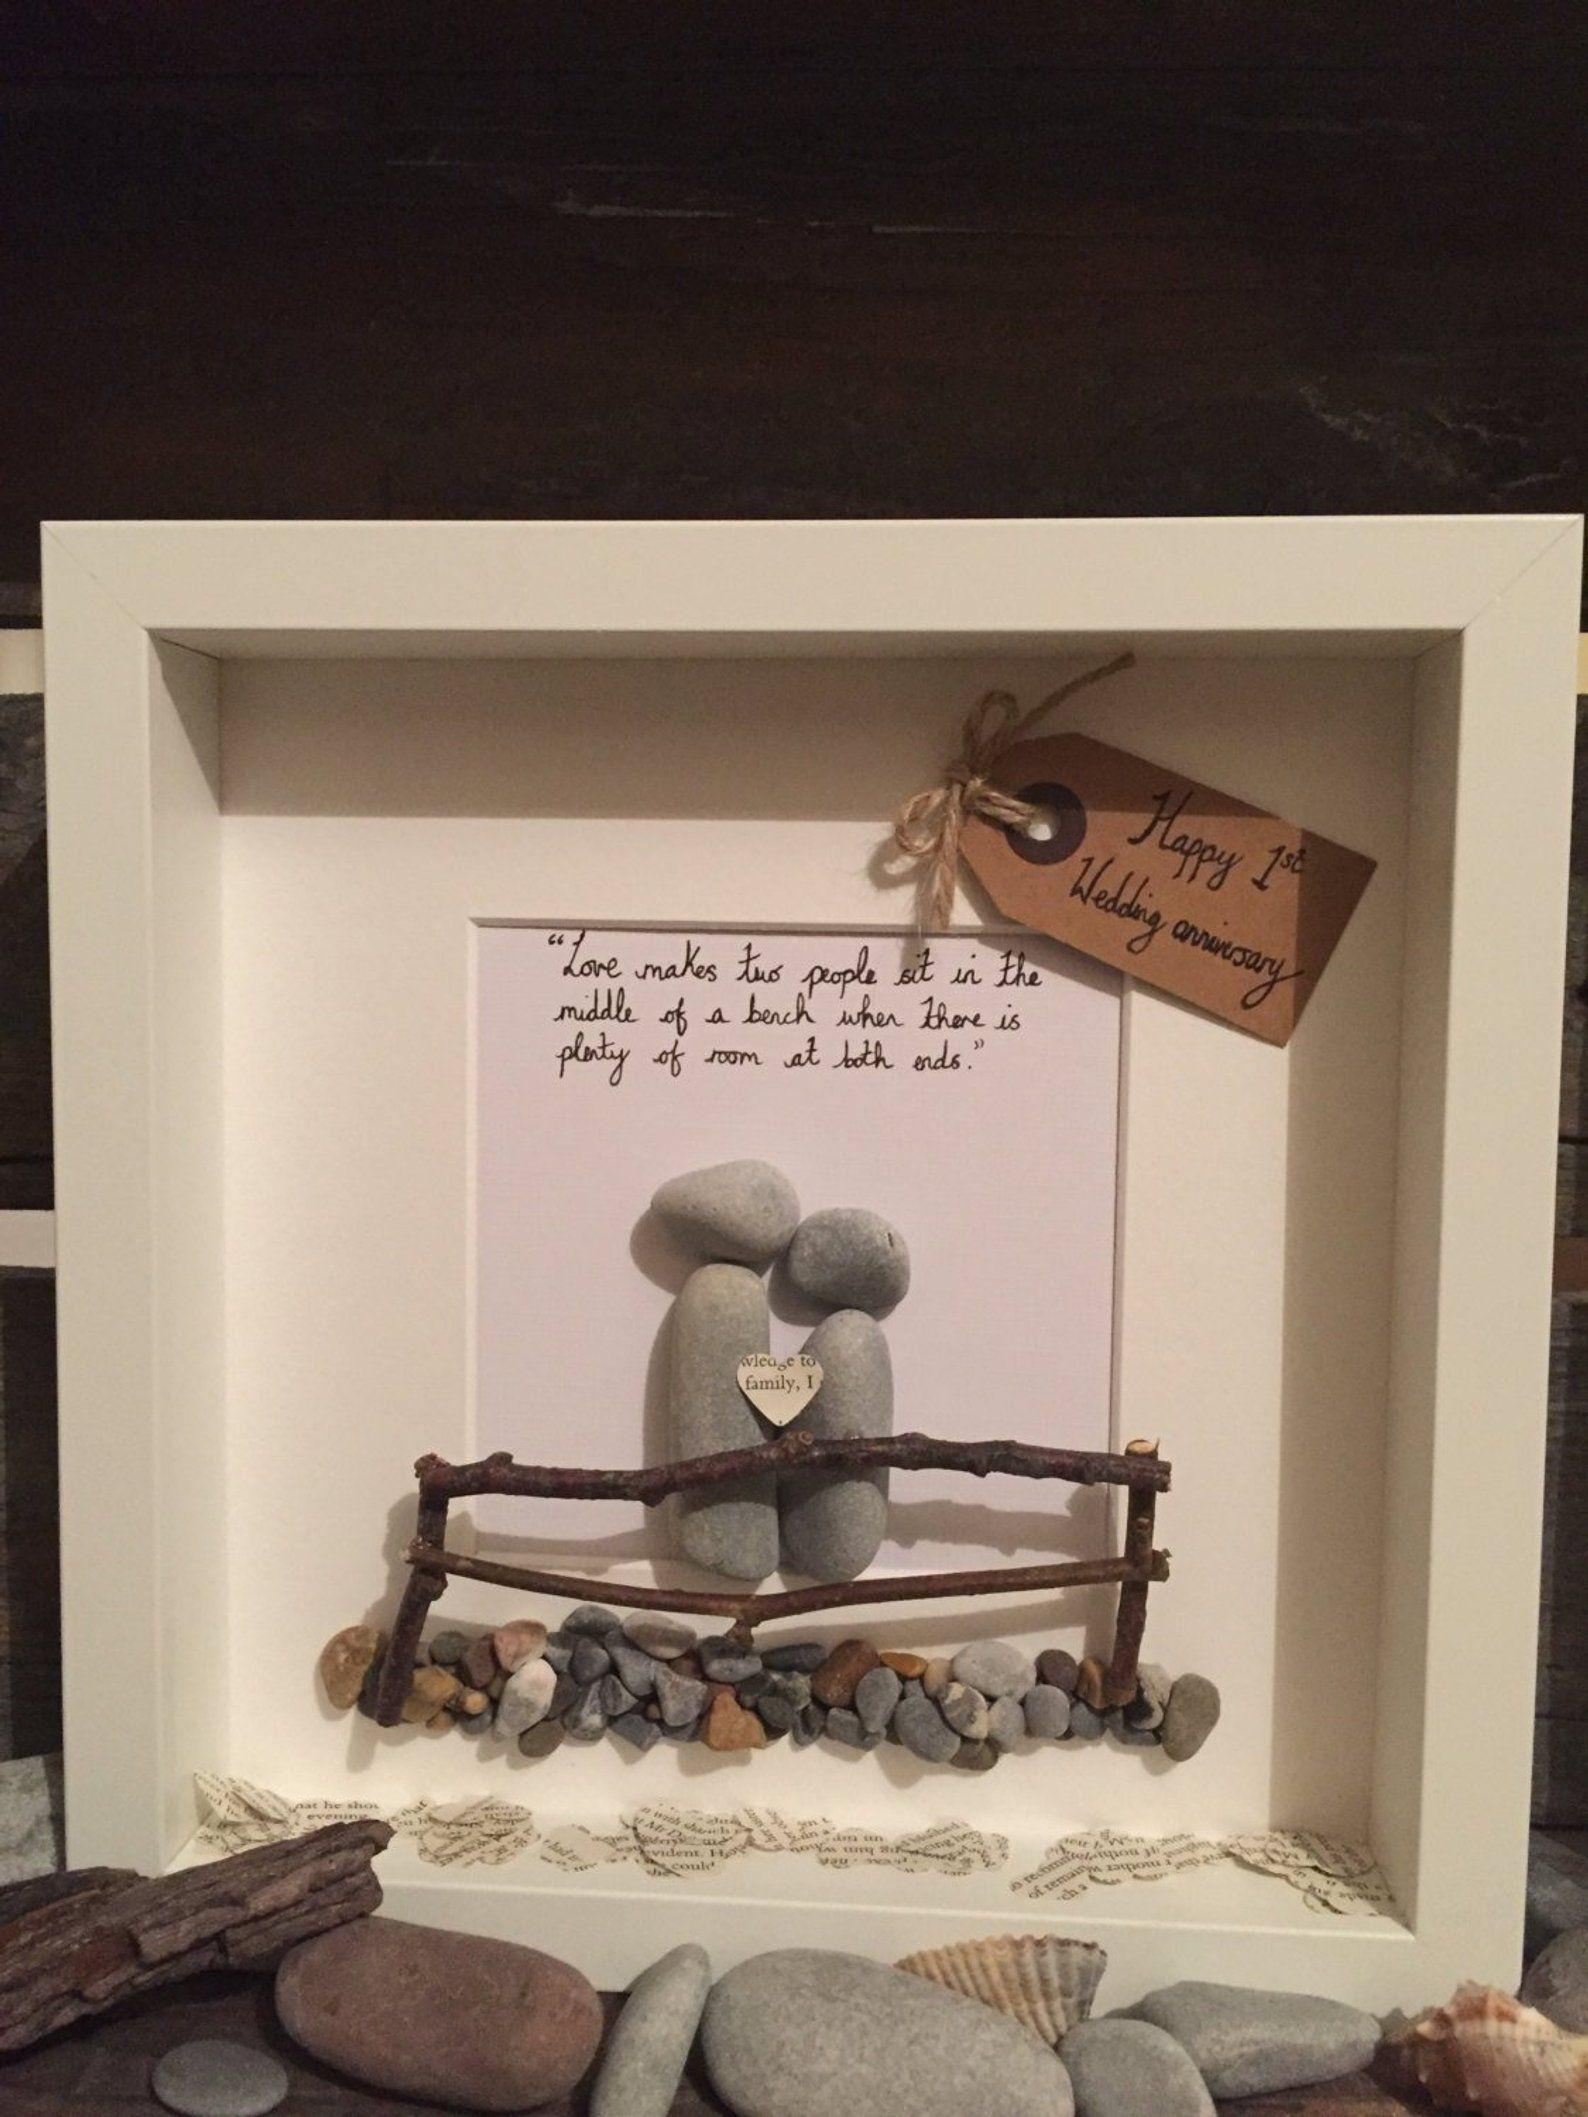 1st wedding anniversary pebble art frame, personalised